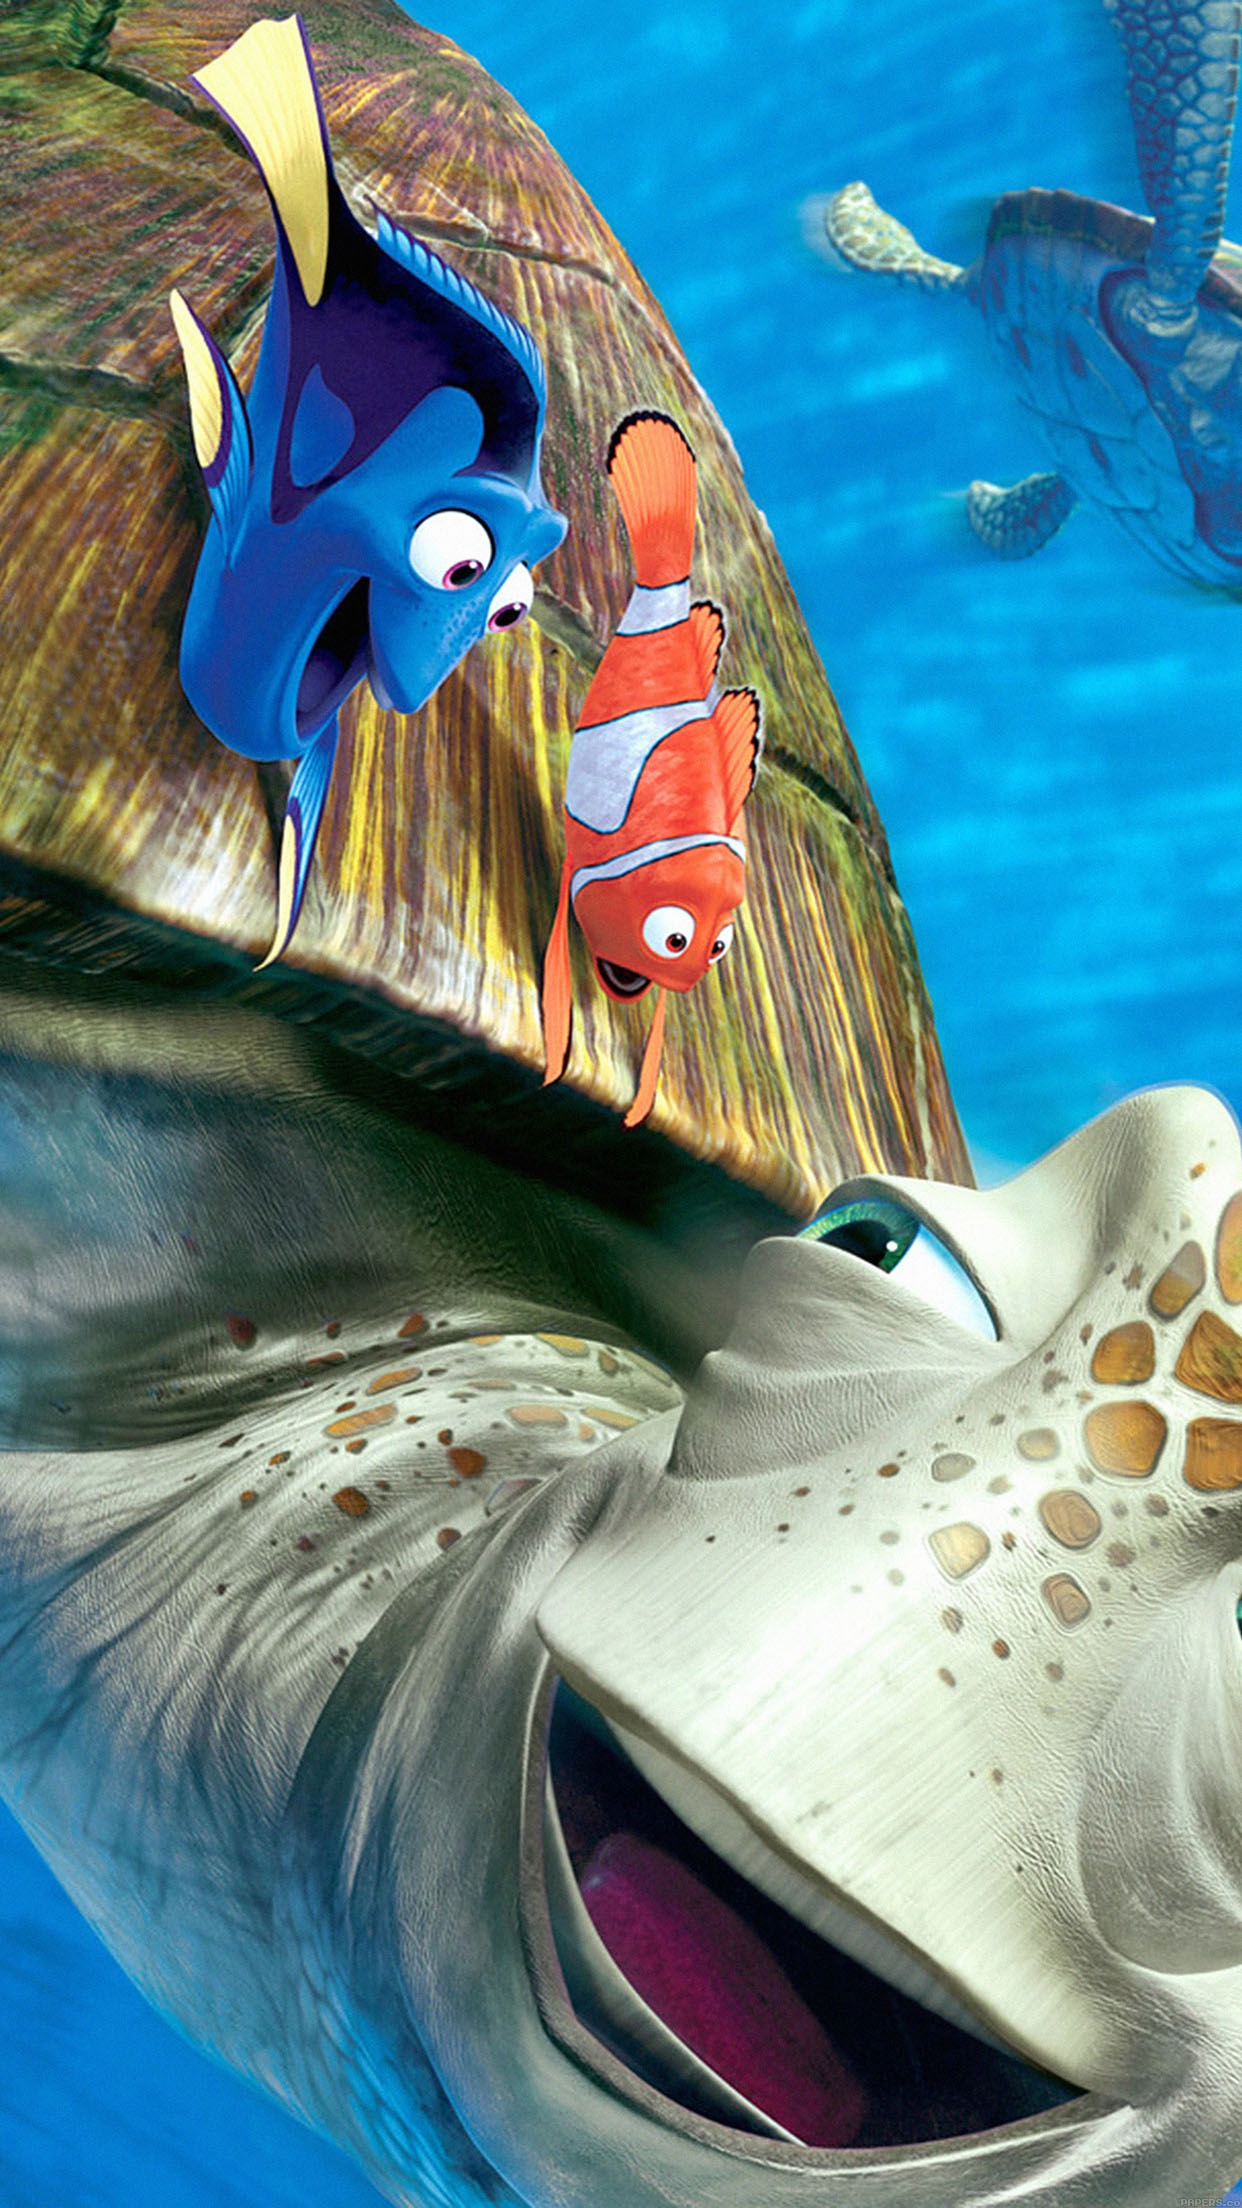 Wallpaper Finding Nemo Disney Pixar Illust Sea Animals Android